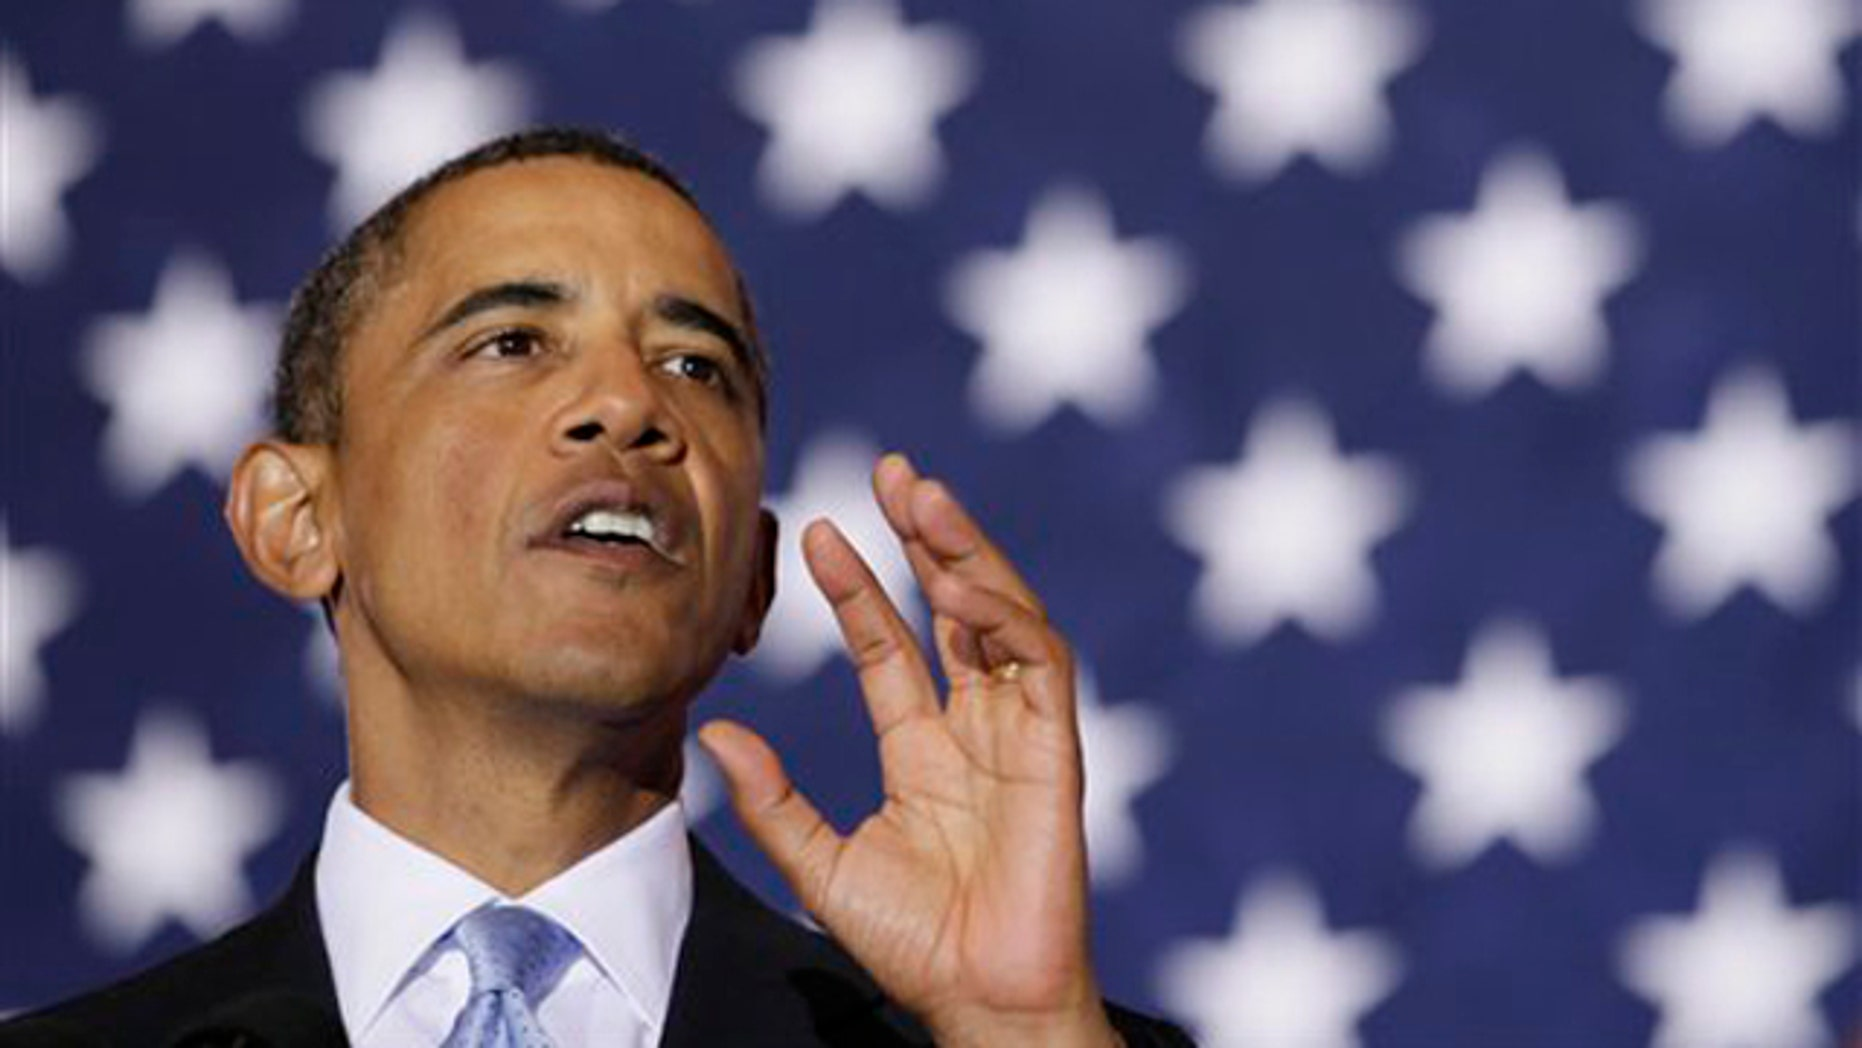 President Obama speaks at Xavier University of Louisiana in New Orleans Aug. 29 on the fifth anniversary of Hurricane Katrina. (AP Photo)